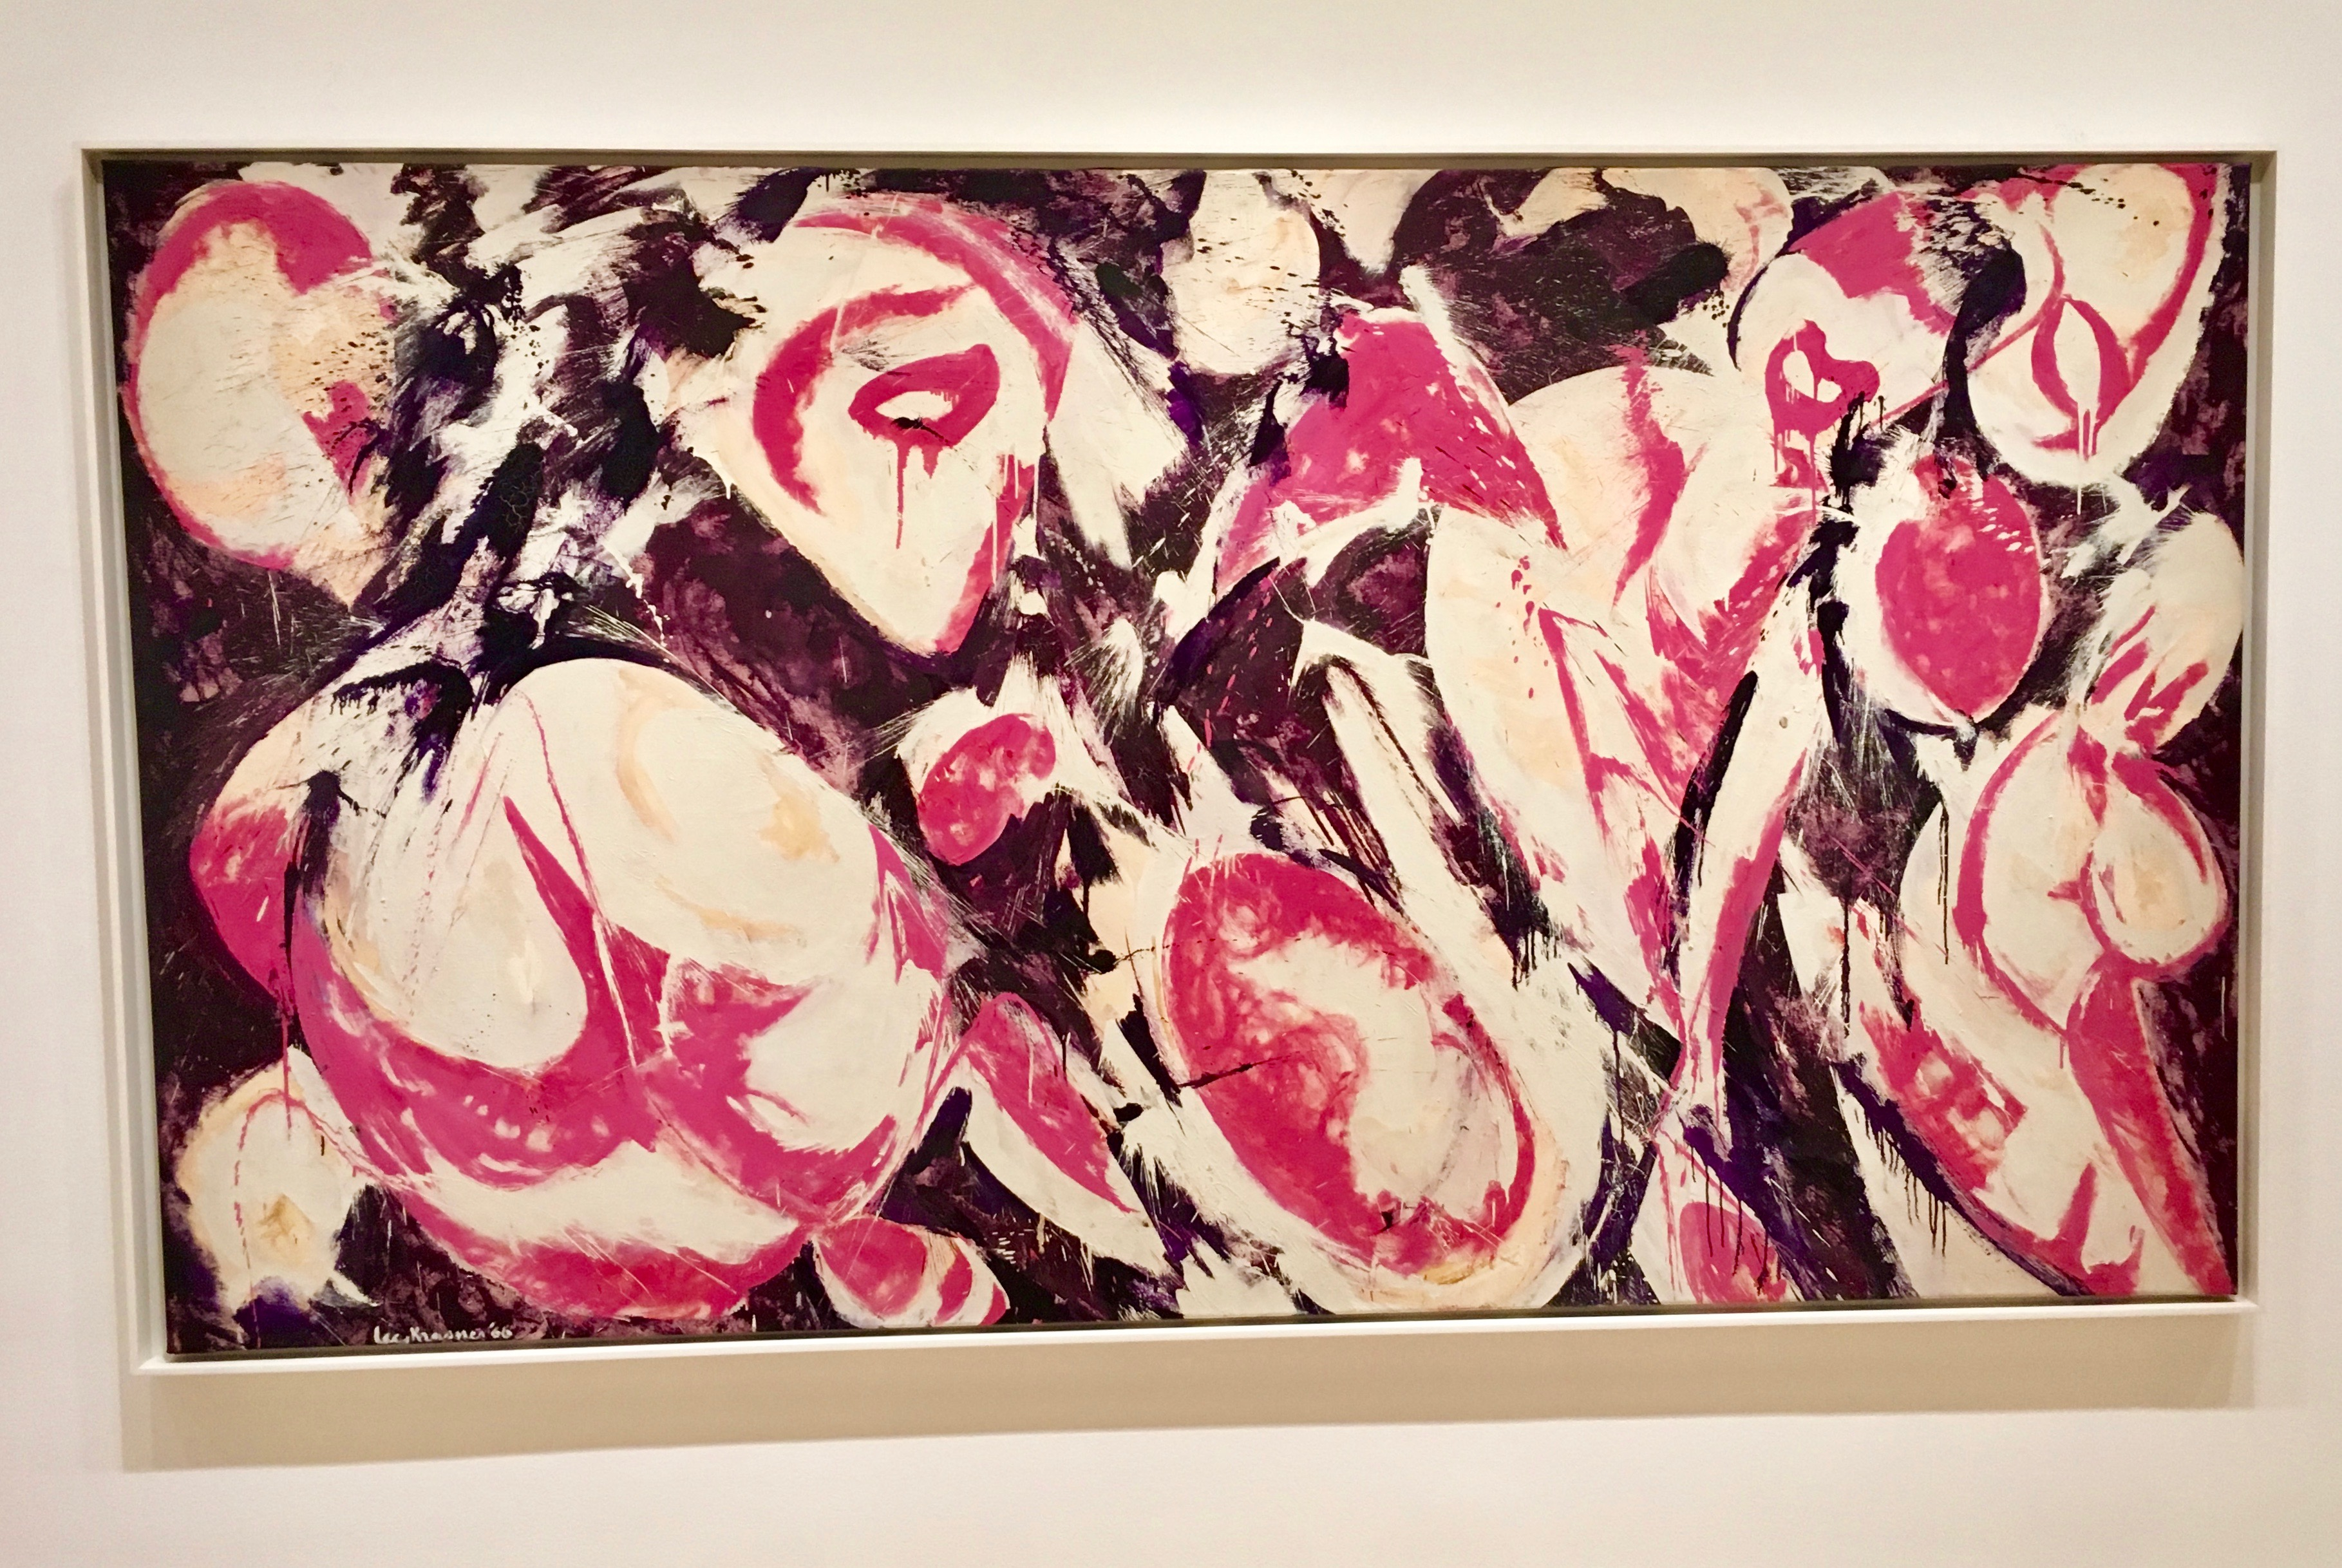 "LEE KRASNER (American, 1908–1984) Gaea 1966 Oil on canvas 69"" x 10' 5 1/2"" (175.3 x 318.8 cm) Kay Sage Tanguy Fund Ellen G. Landau. Lee Krasner: a catalogue raisonne. New York: Abrams, 1995, cat. CR440, pp. 234-235. 212.1977"